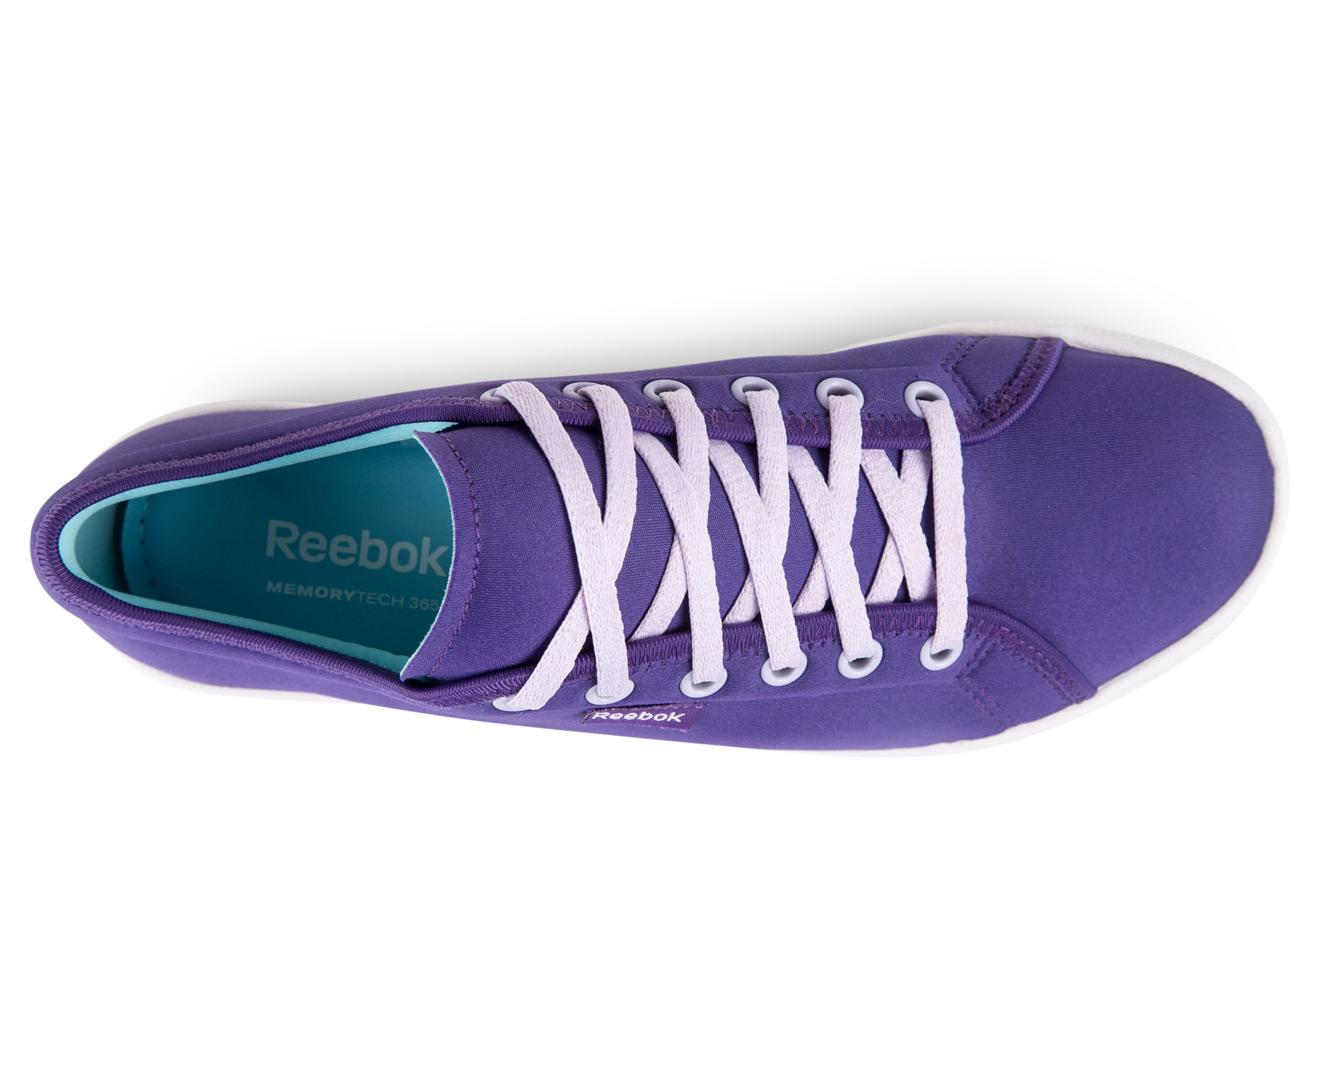 eb066dc72d08 Reebok Women s Skyscape Runaround 2.0 Shoe - Violet Purple Glow White